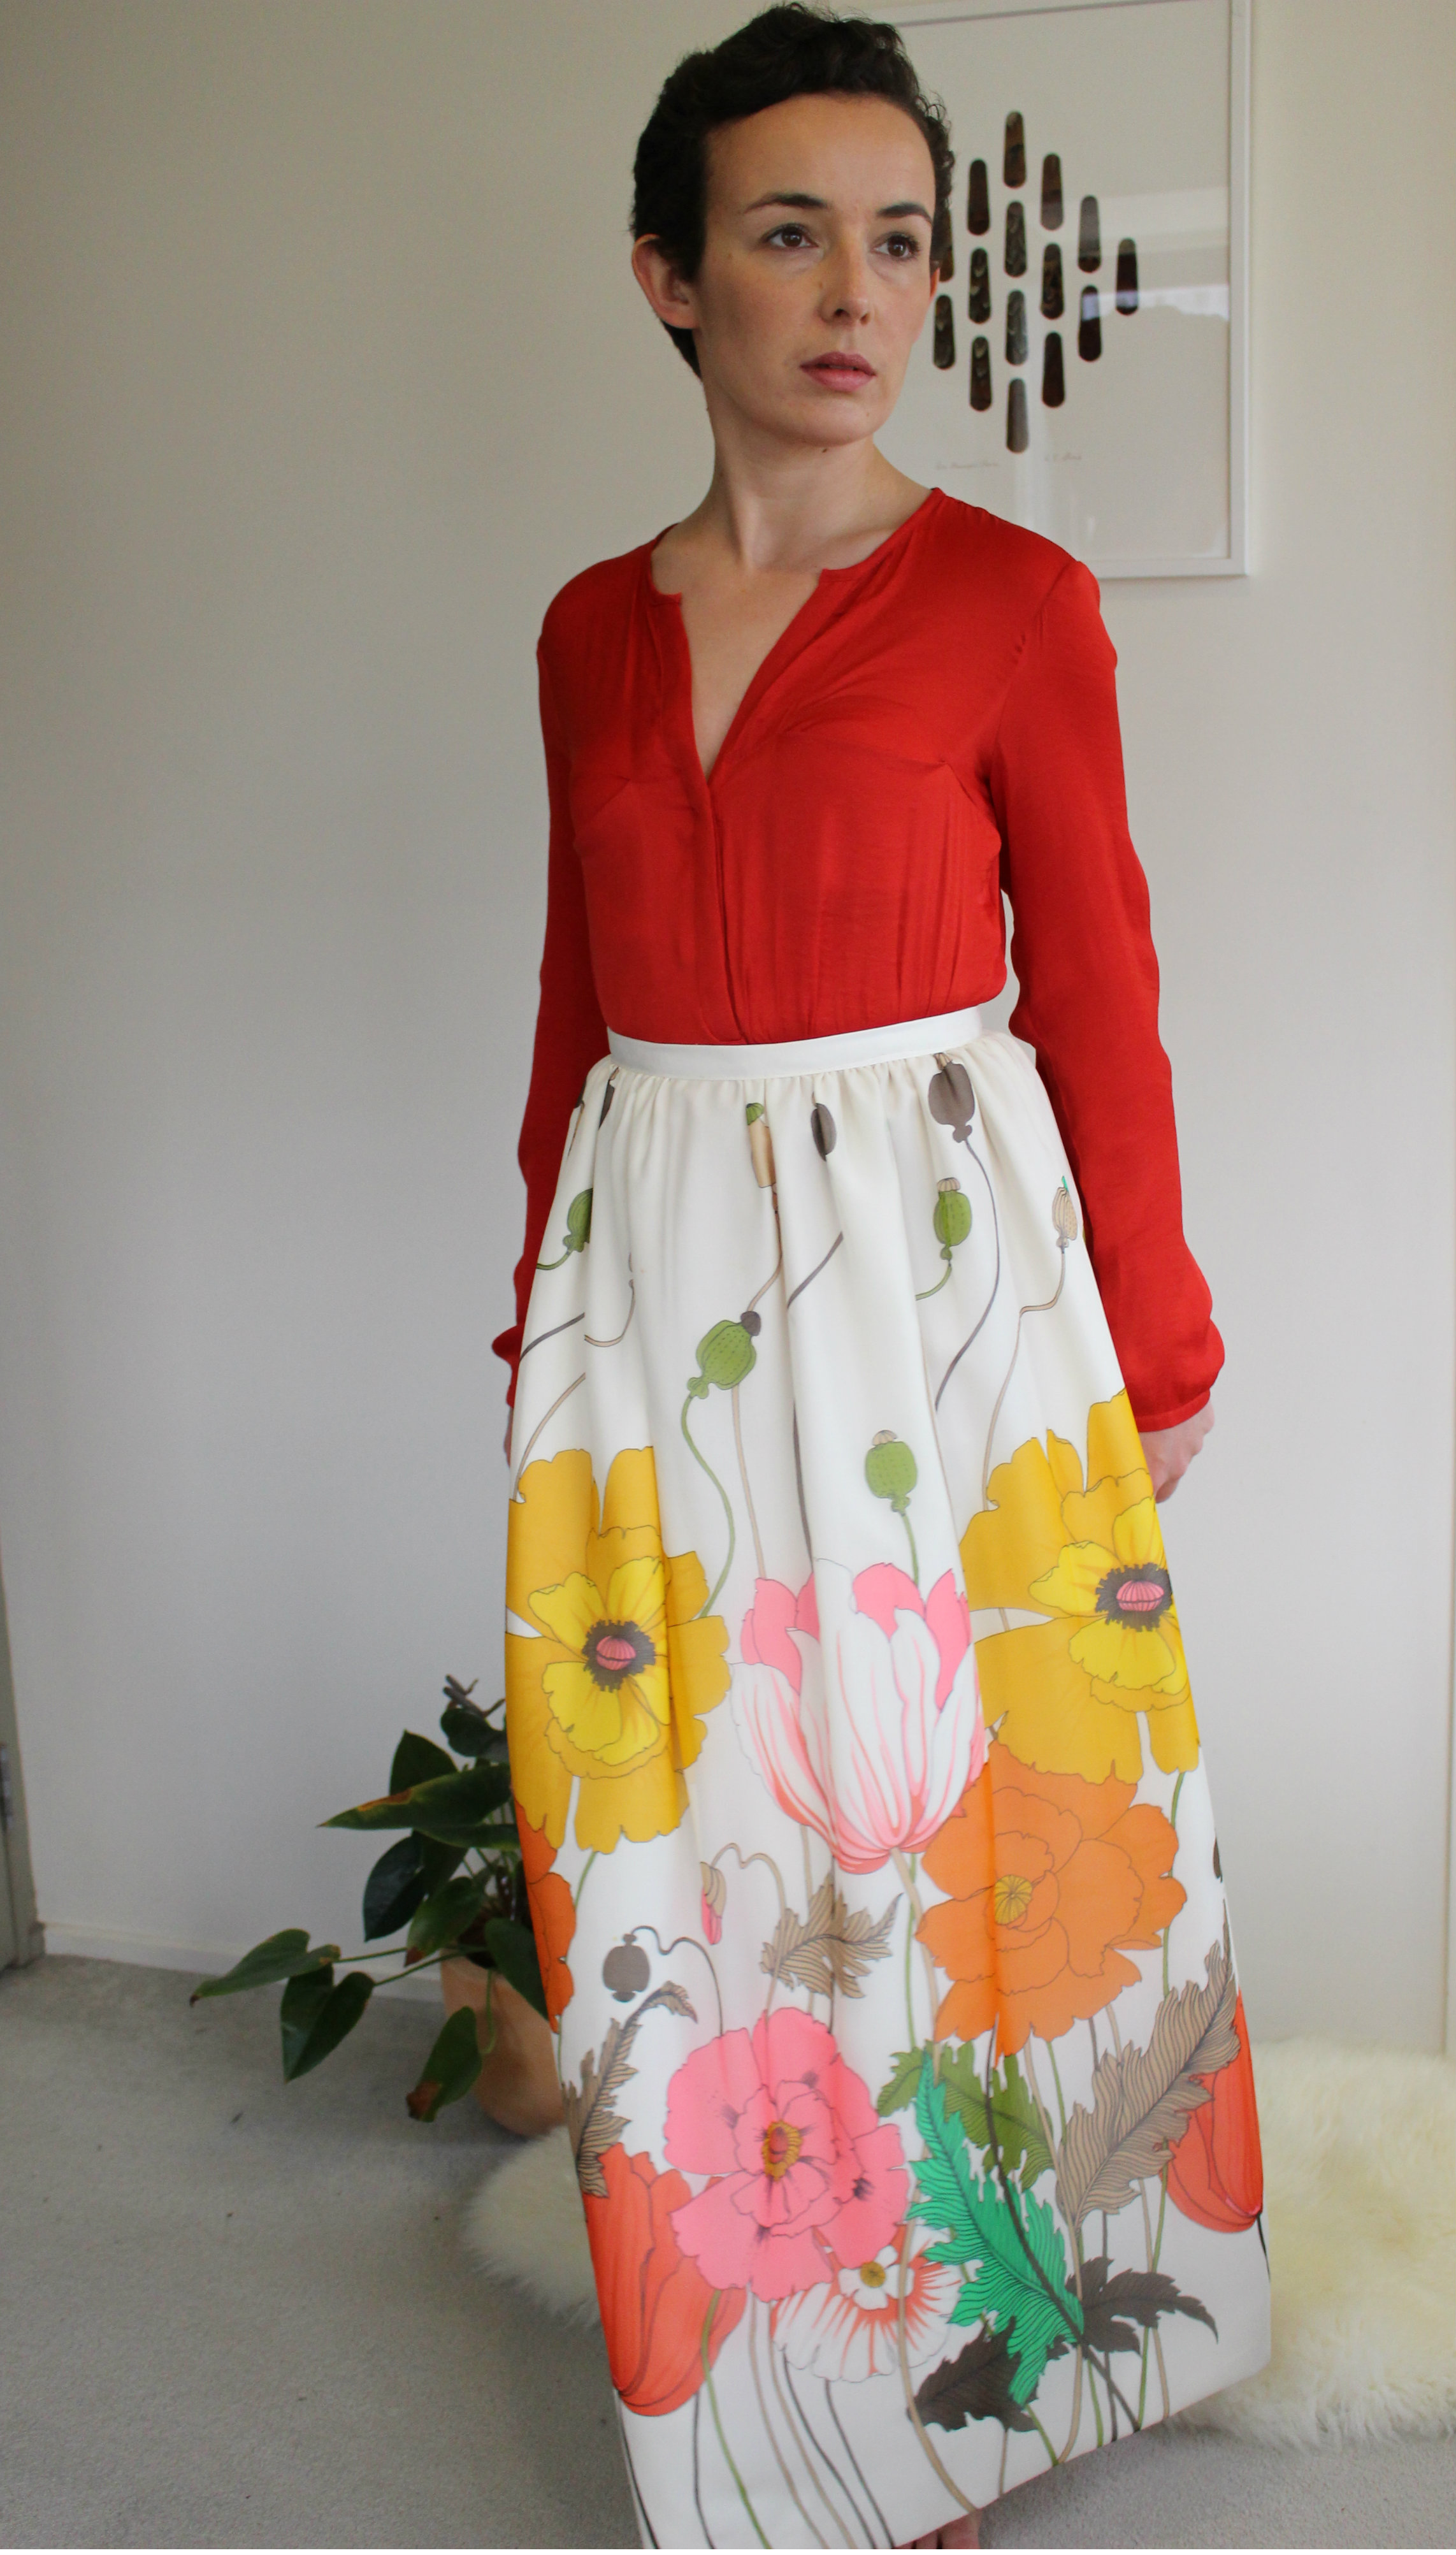 Blouse: Trafaluc (Zara) via Recycle Boutique, Skirt: no label via Thrift